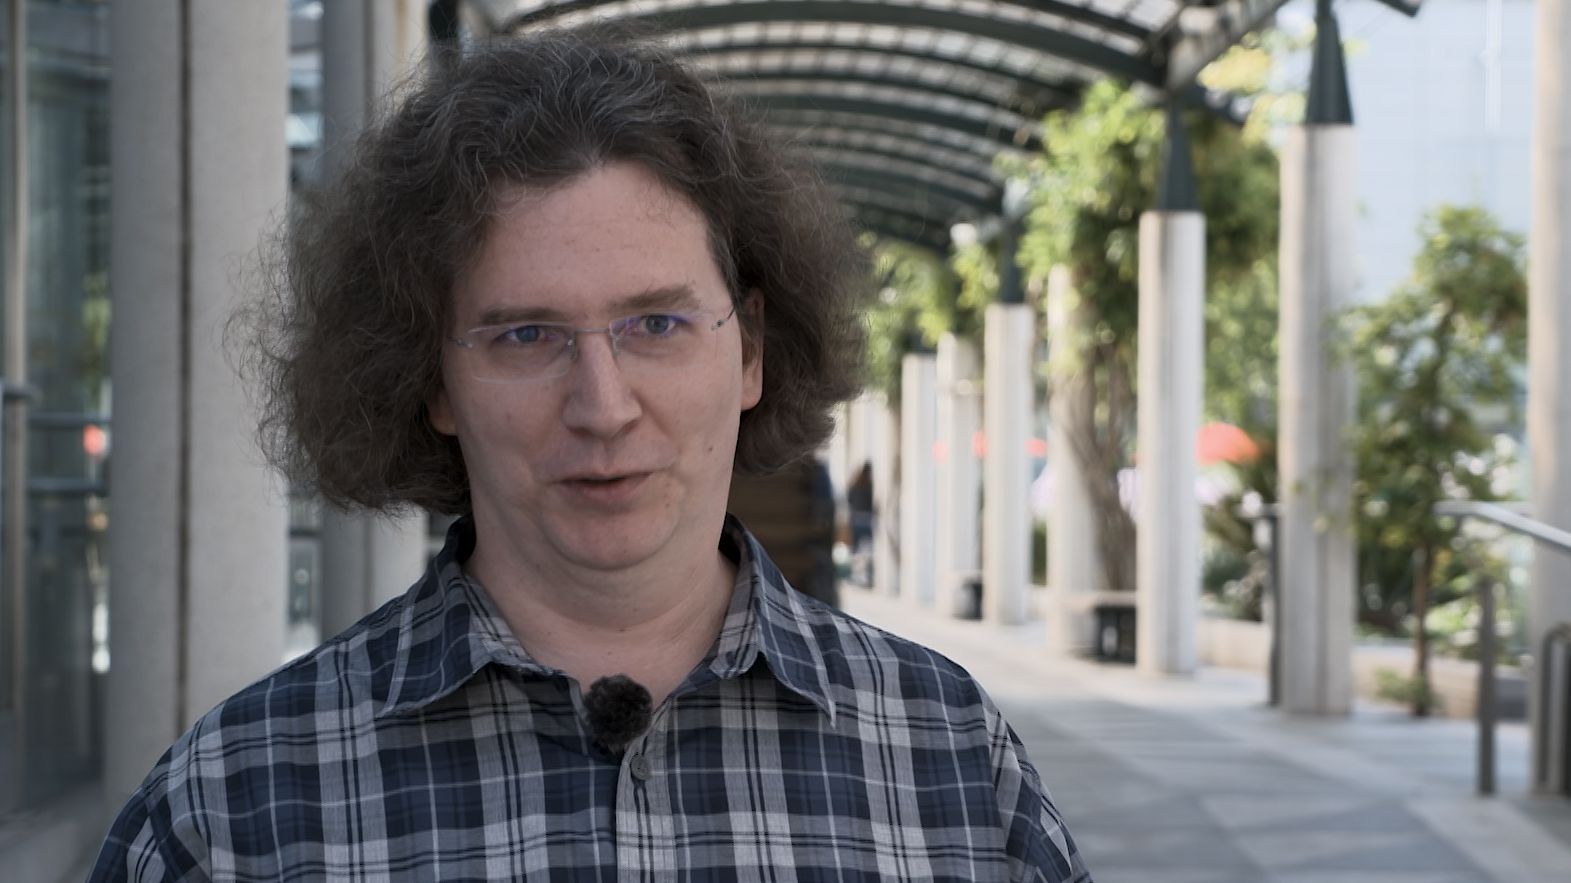 TechCrunch-Reporter Frederic Lardinois